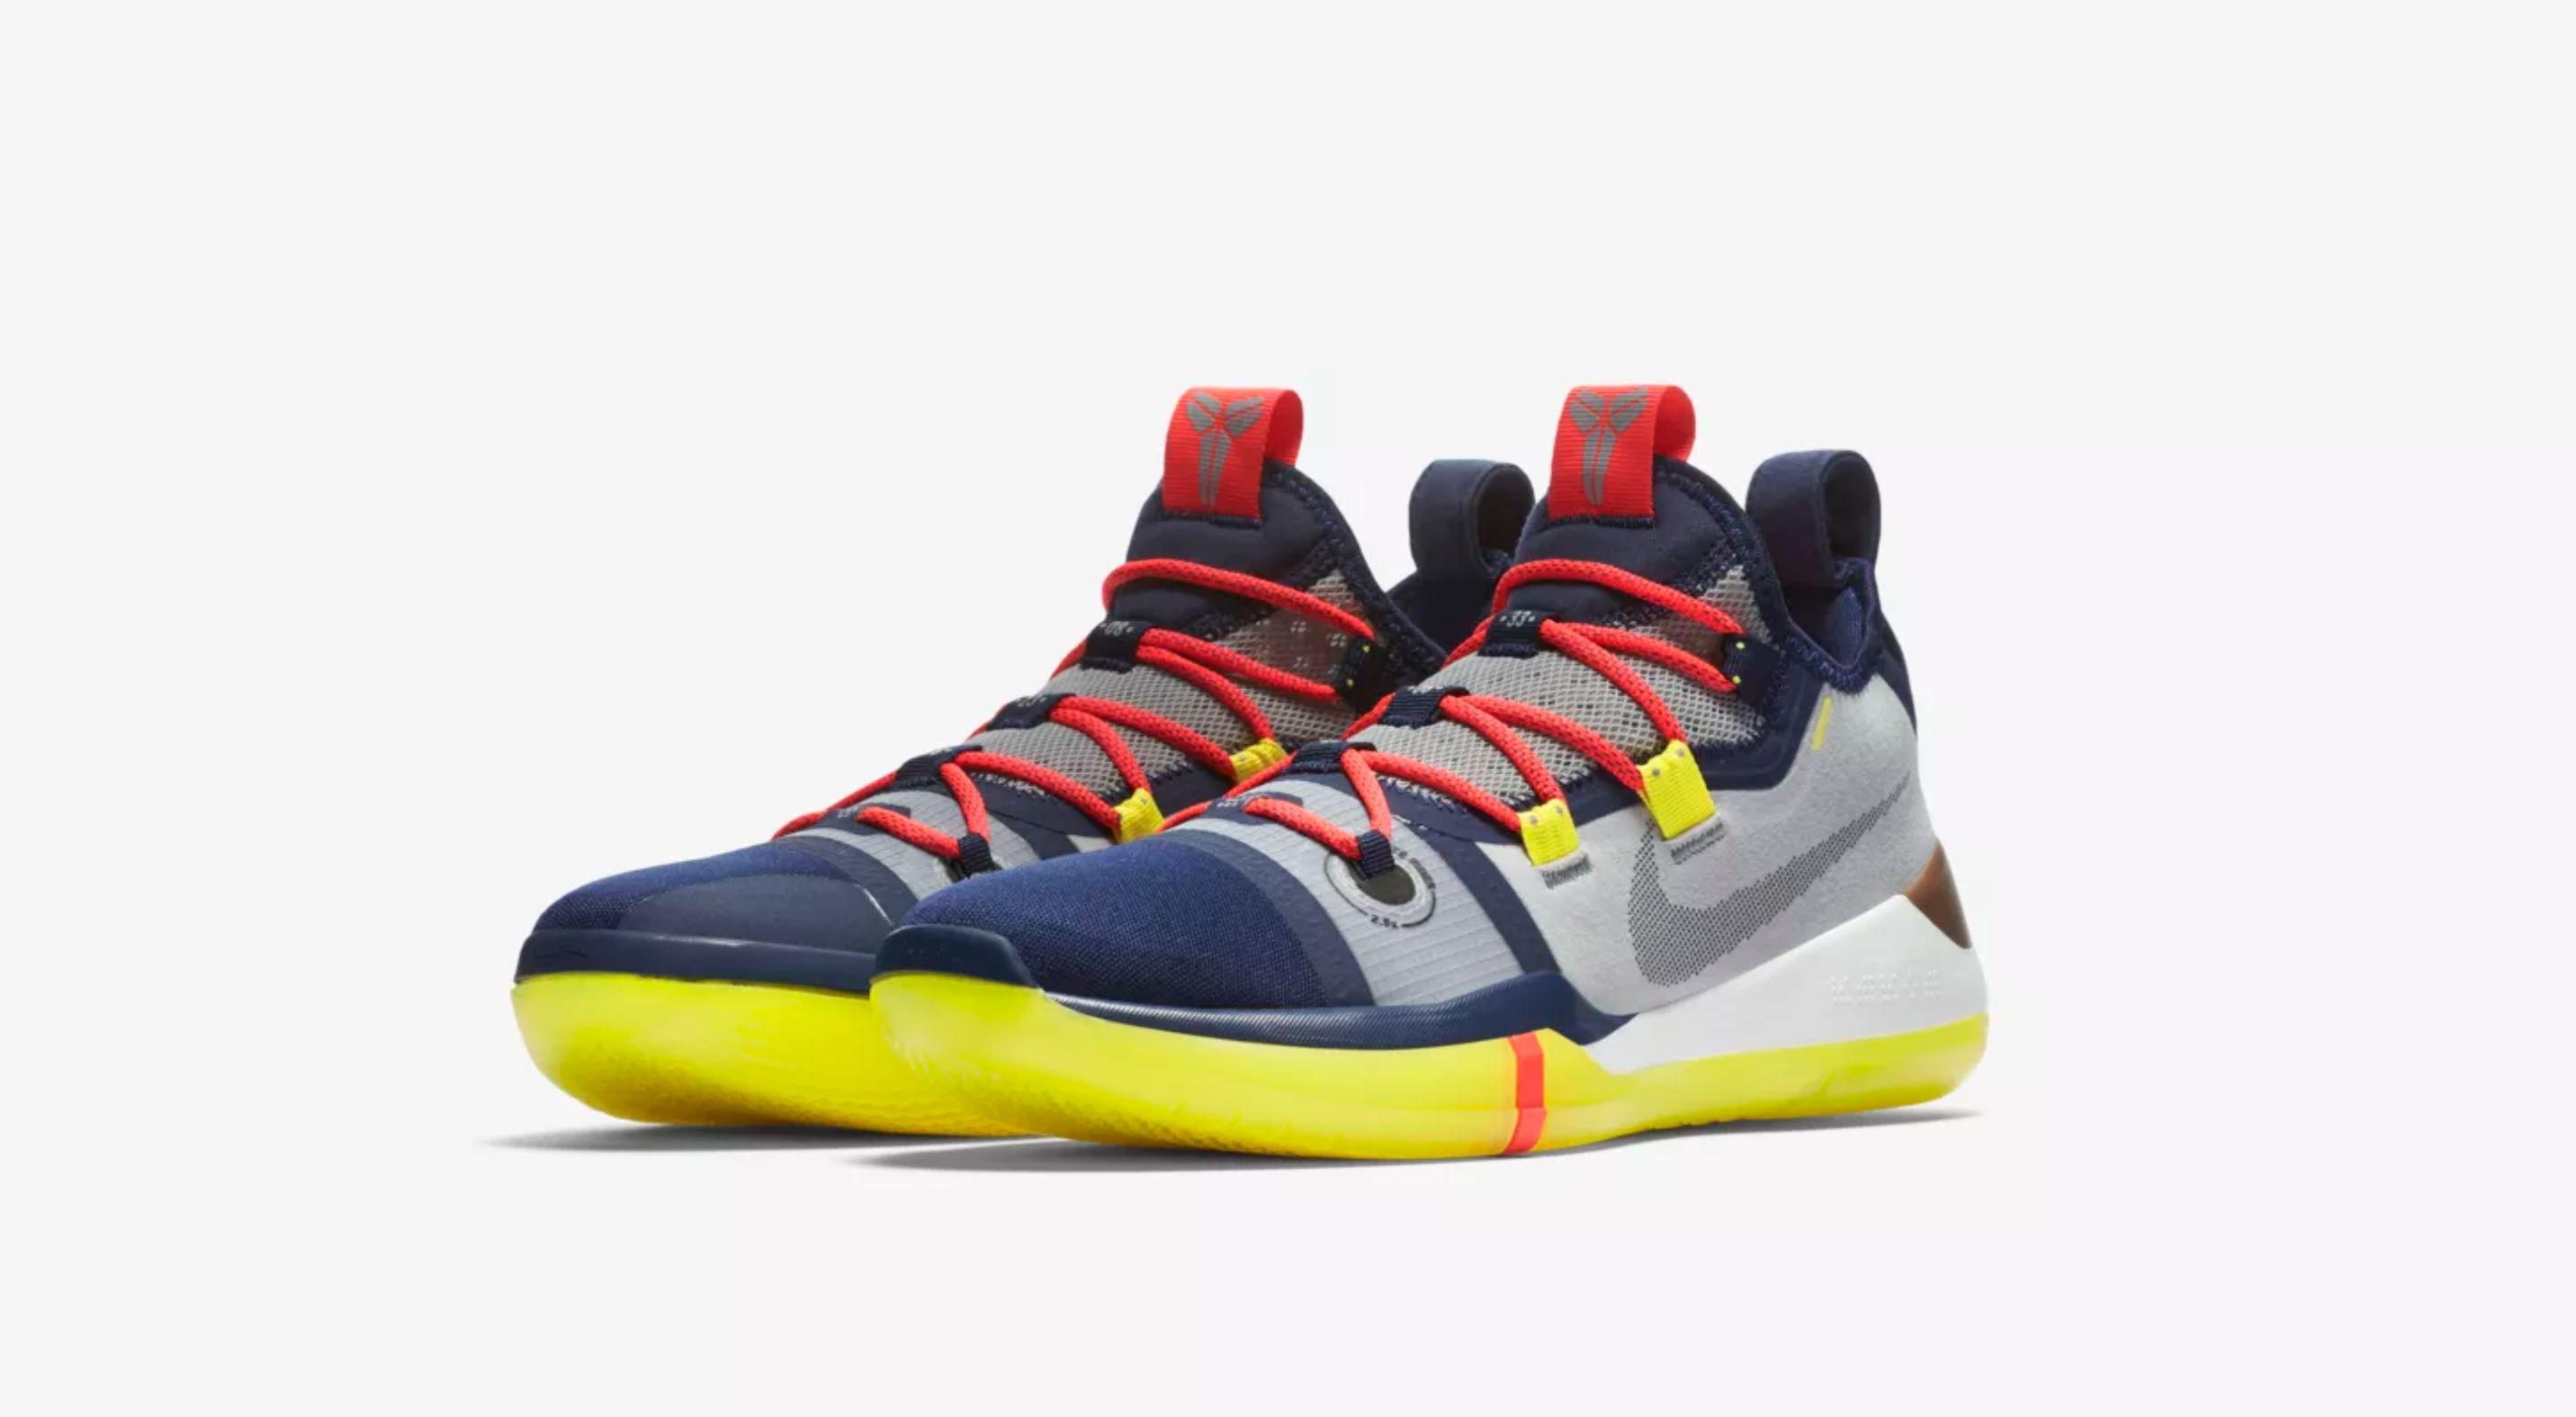 Kobe Bryant S Latest Nike Kobe Ad Gets Confirmed Tech Specs Weartesters